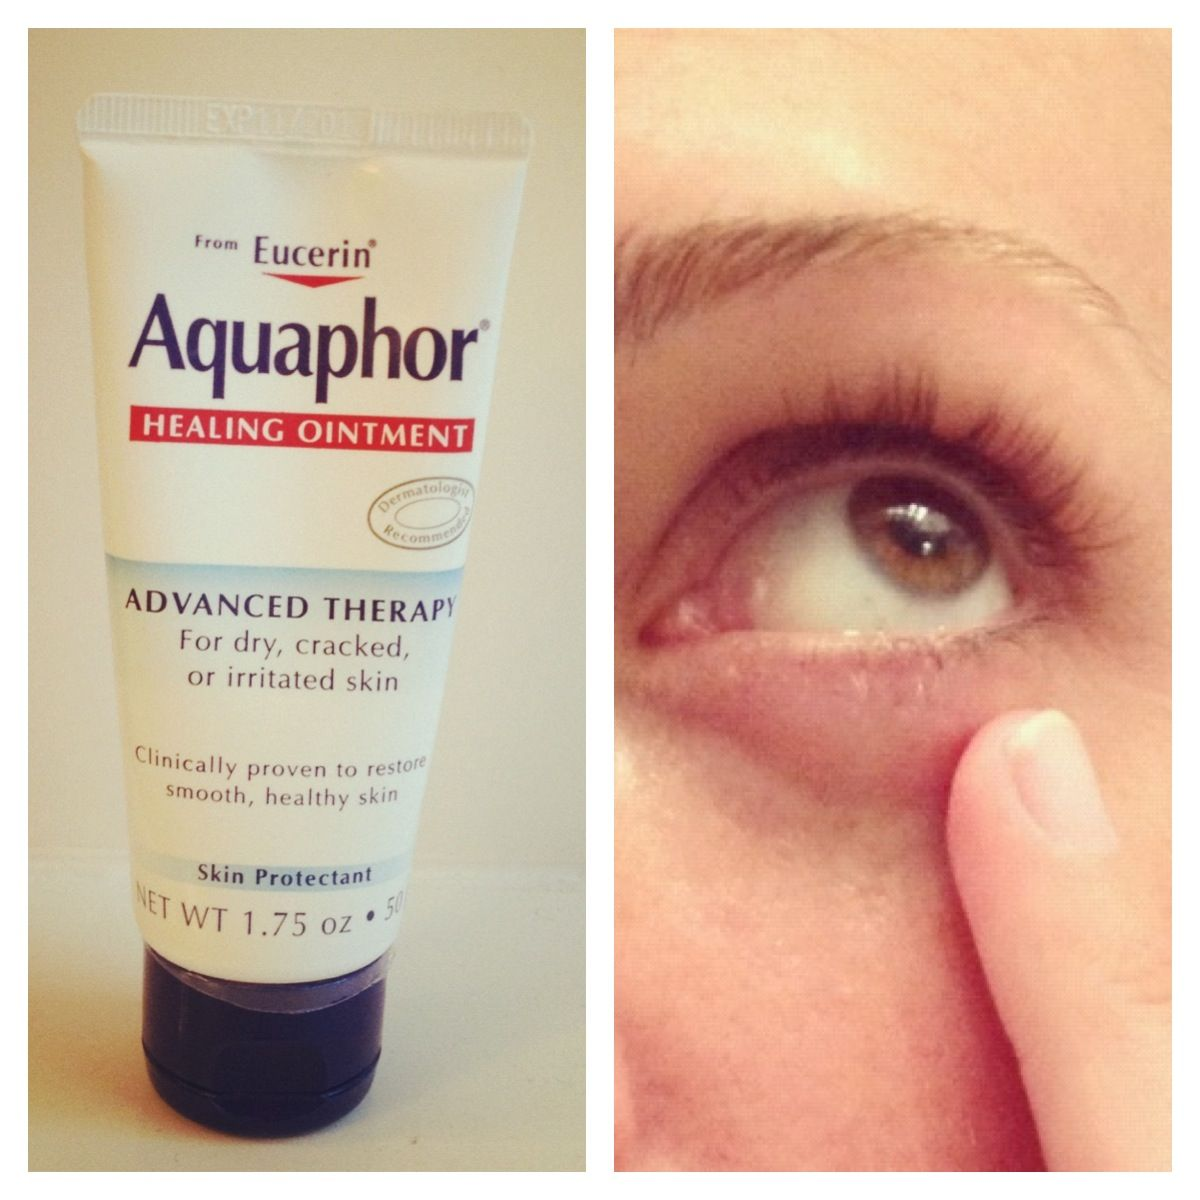 aquaphor on face